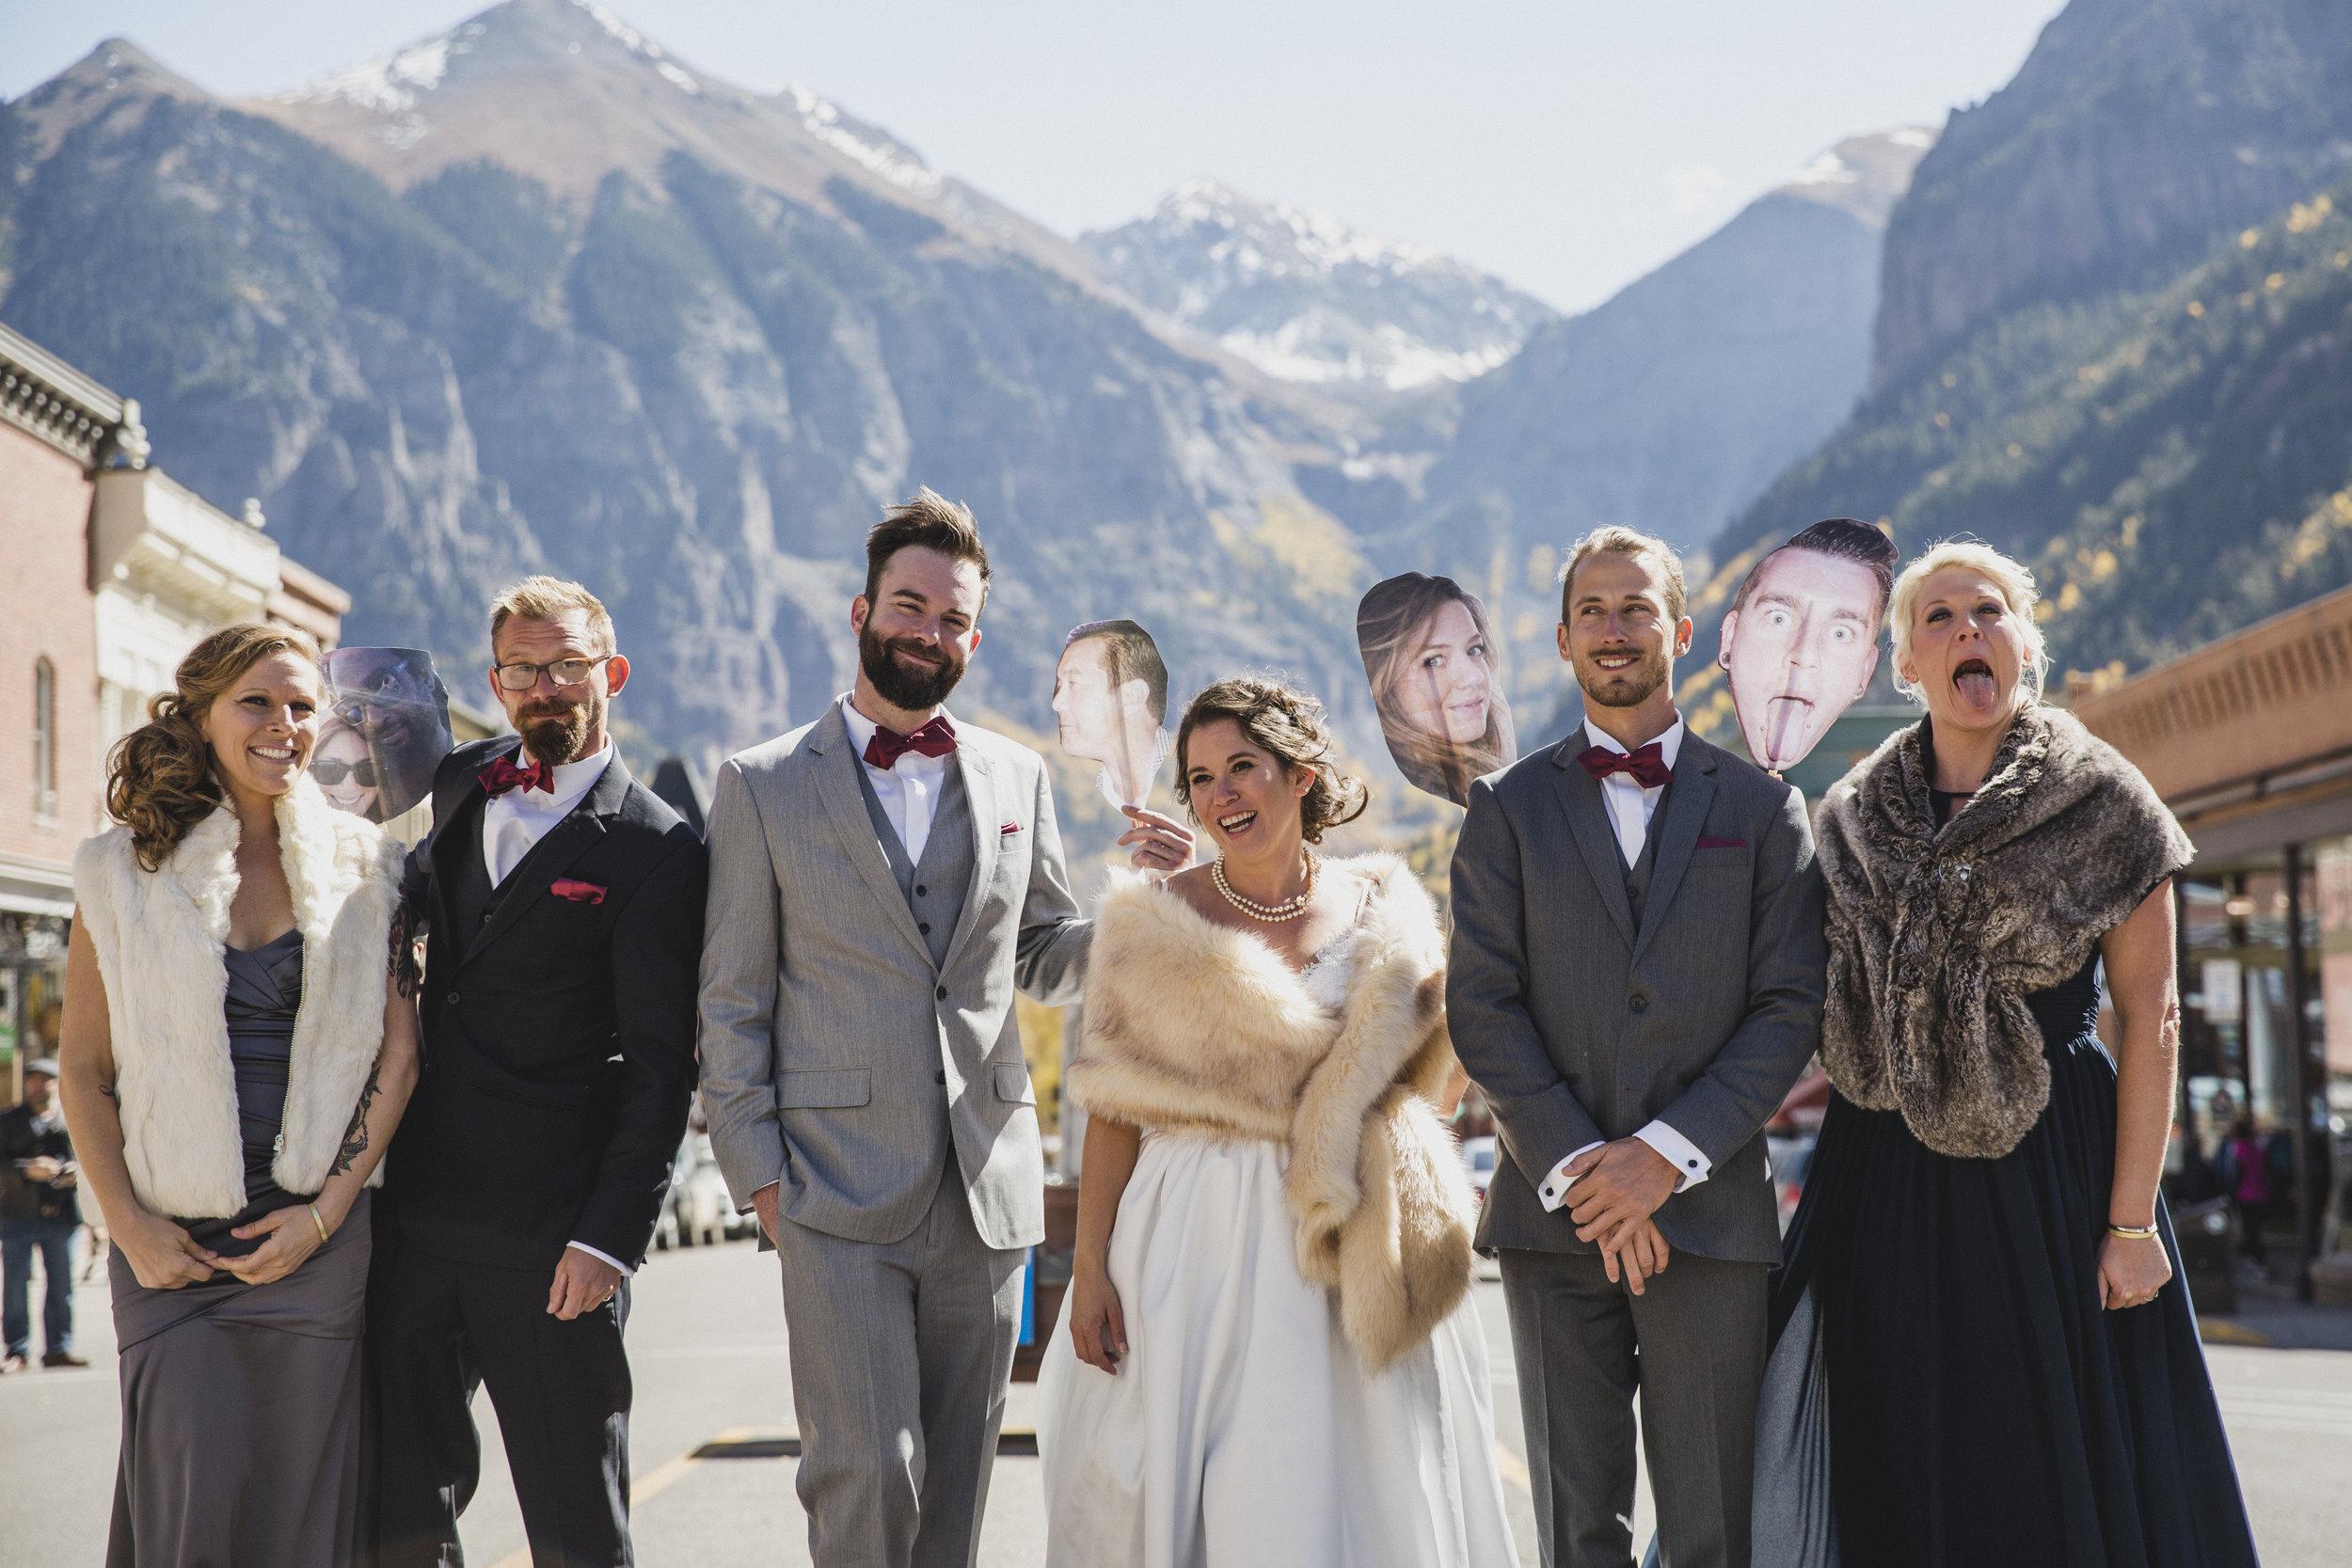 NE-LeahandAshtonphotography-Telluride-Wedding-Photography-8977.jpg